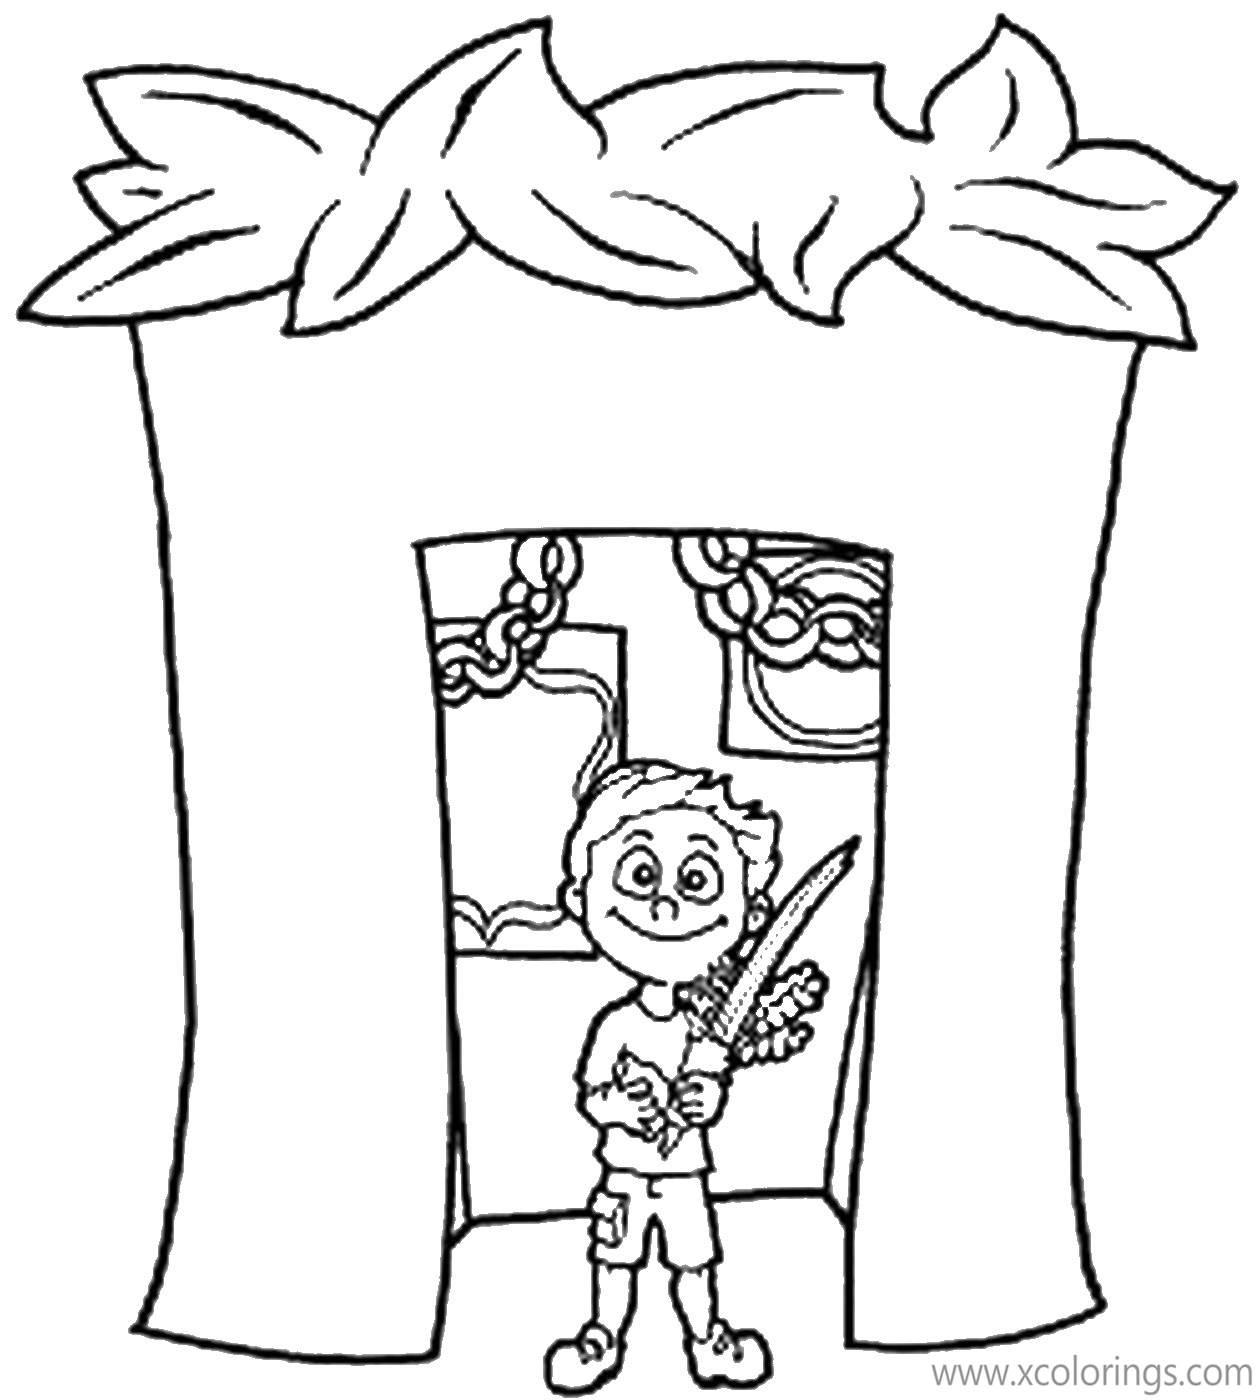 Sukkot Coloring Pages Boy And Sukkah Xcolorings Com